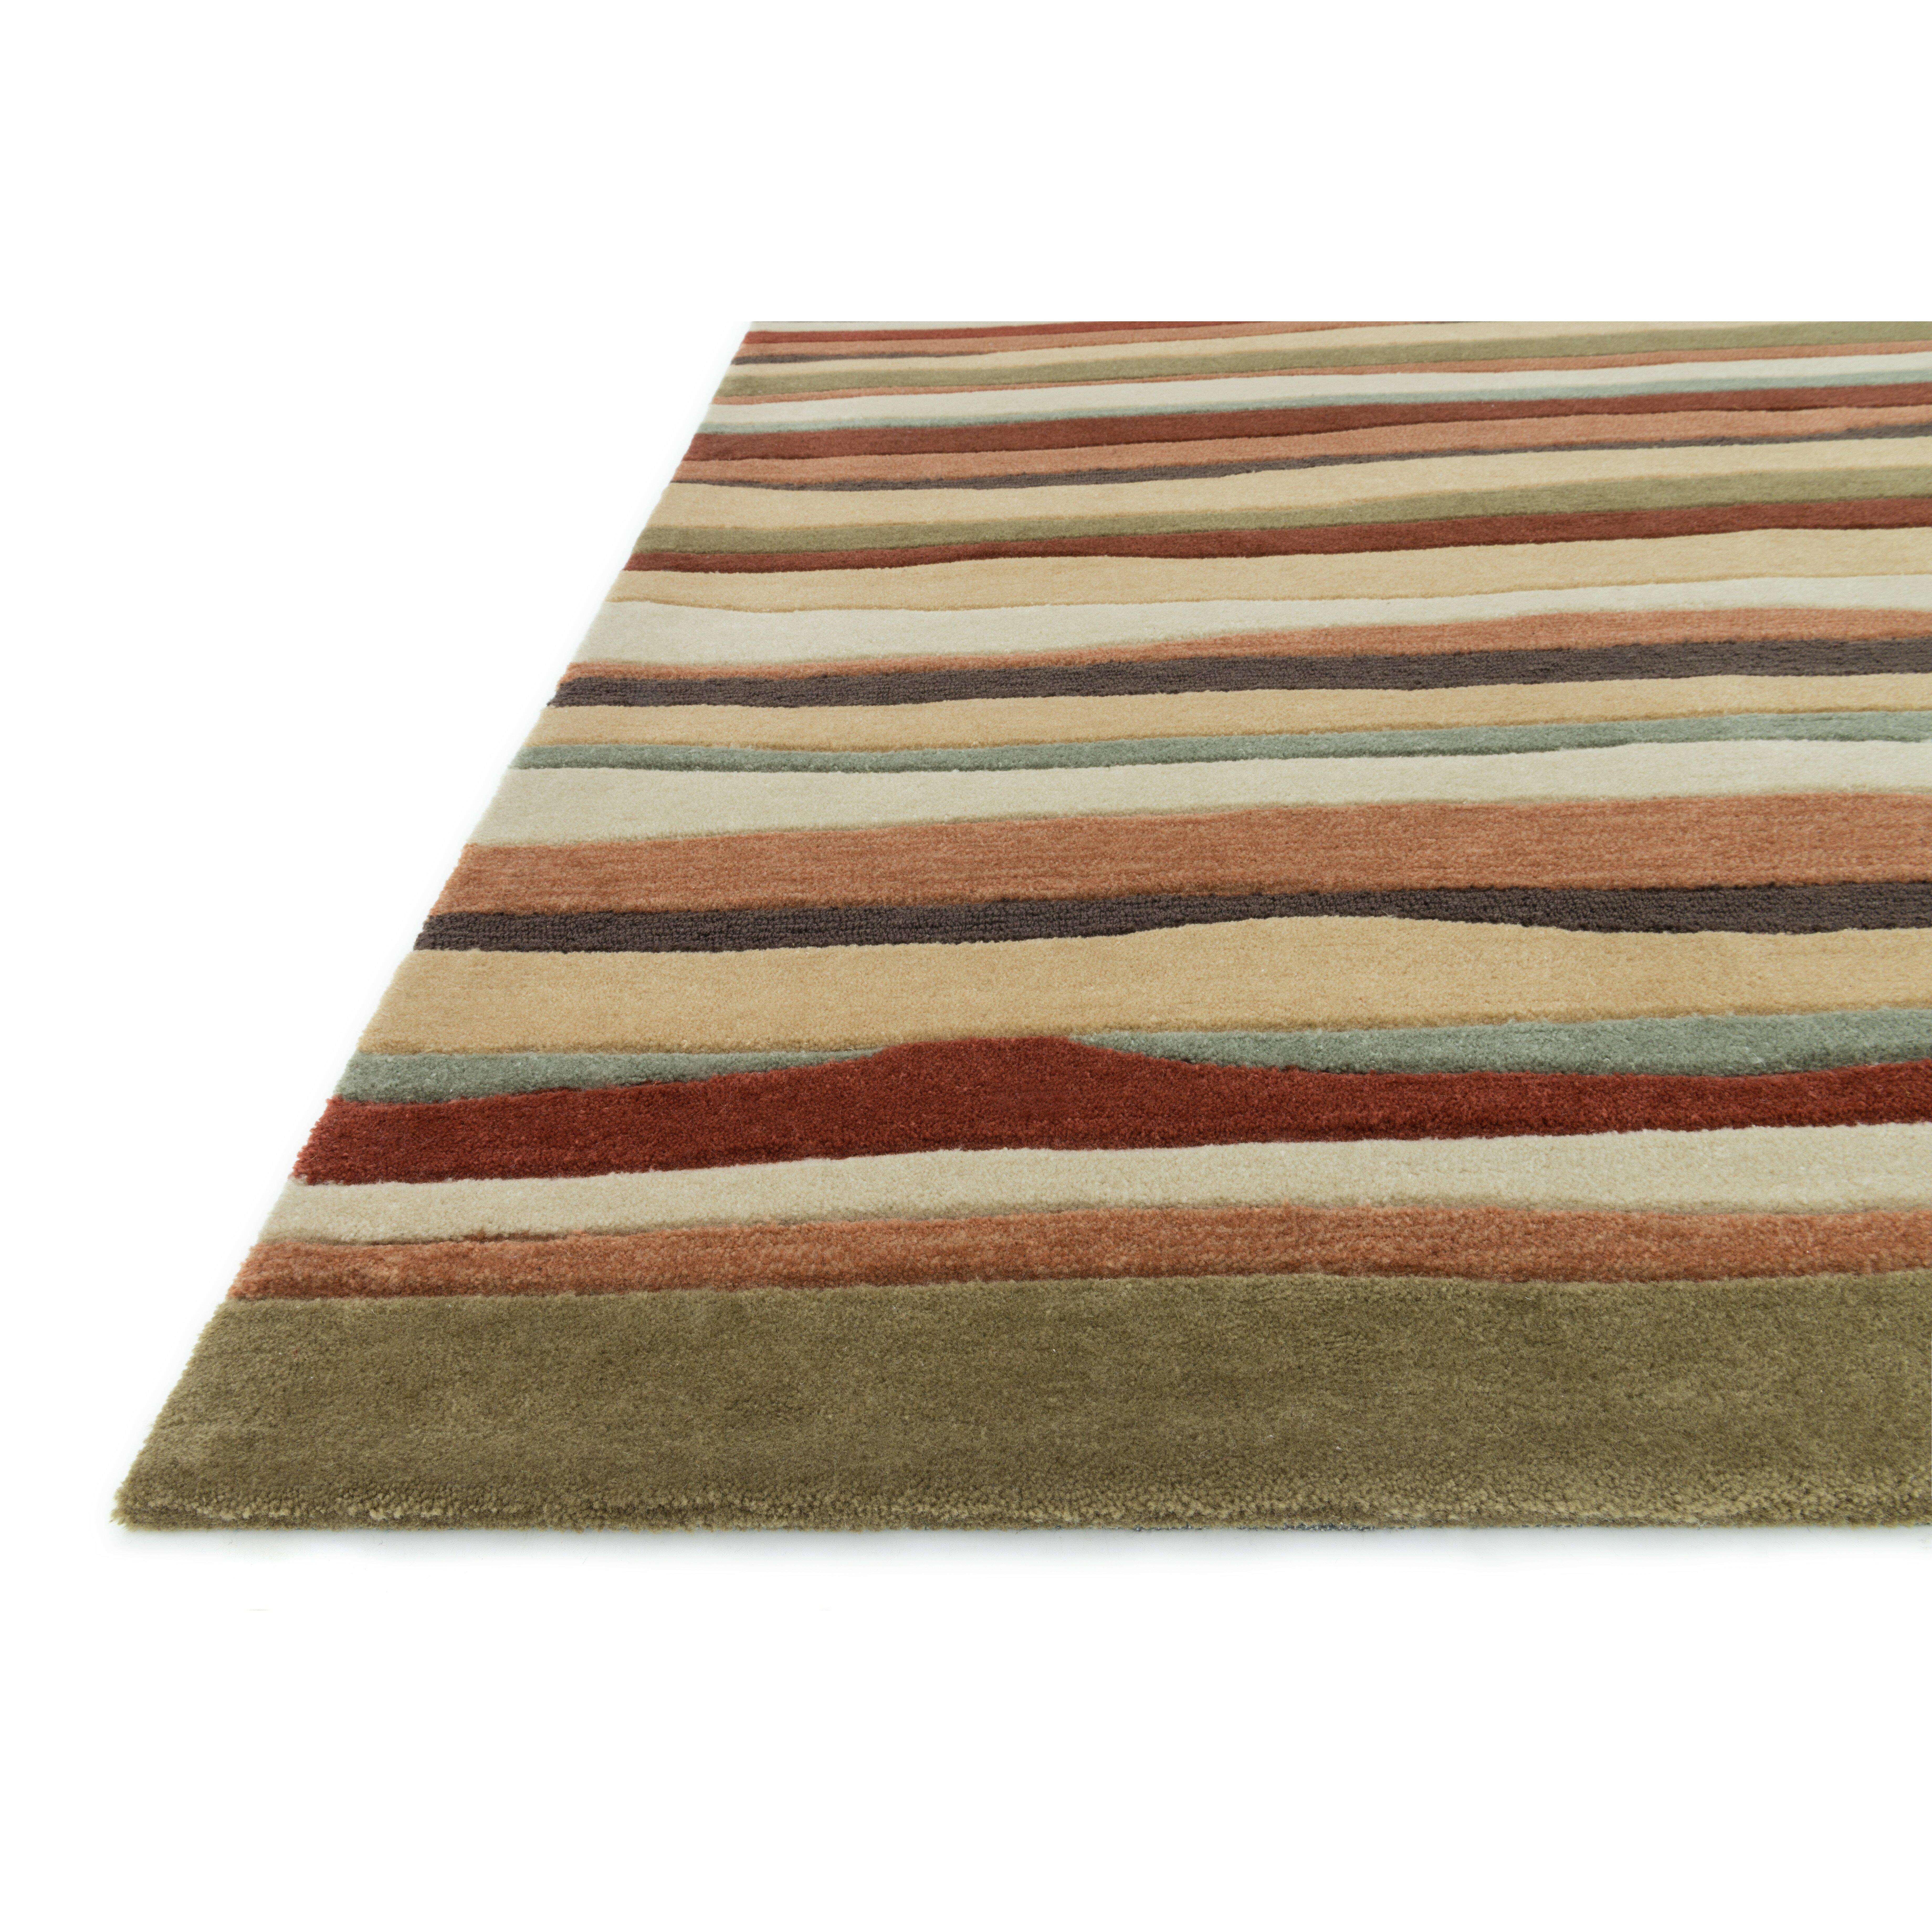 loloi rugs grant orange striped area rug reviews wayfair